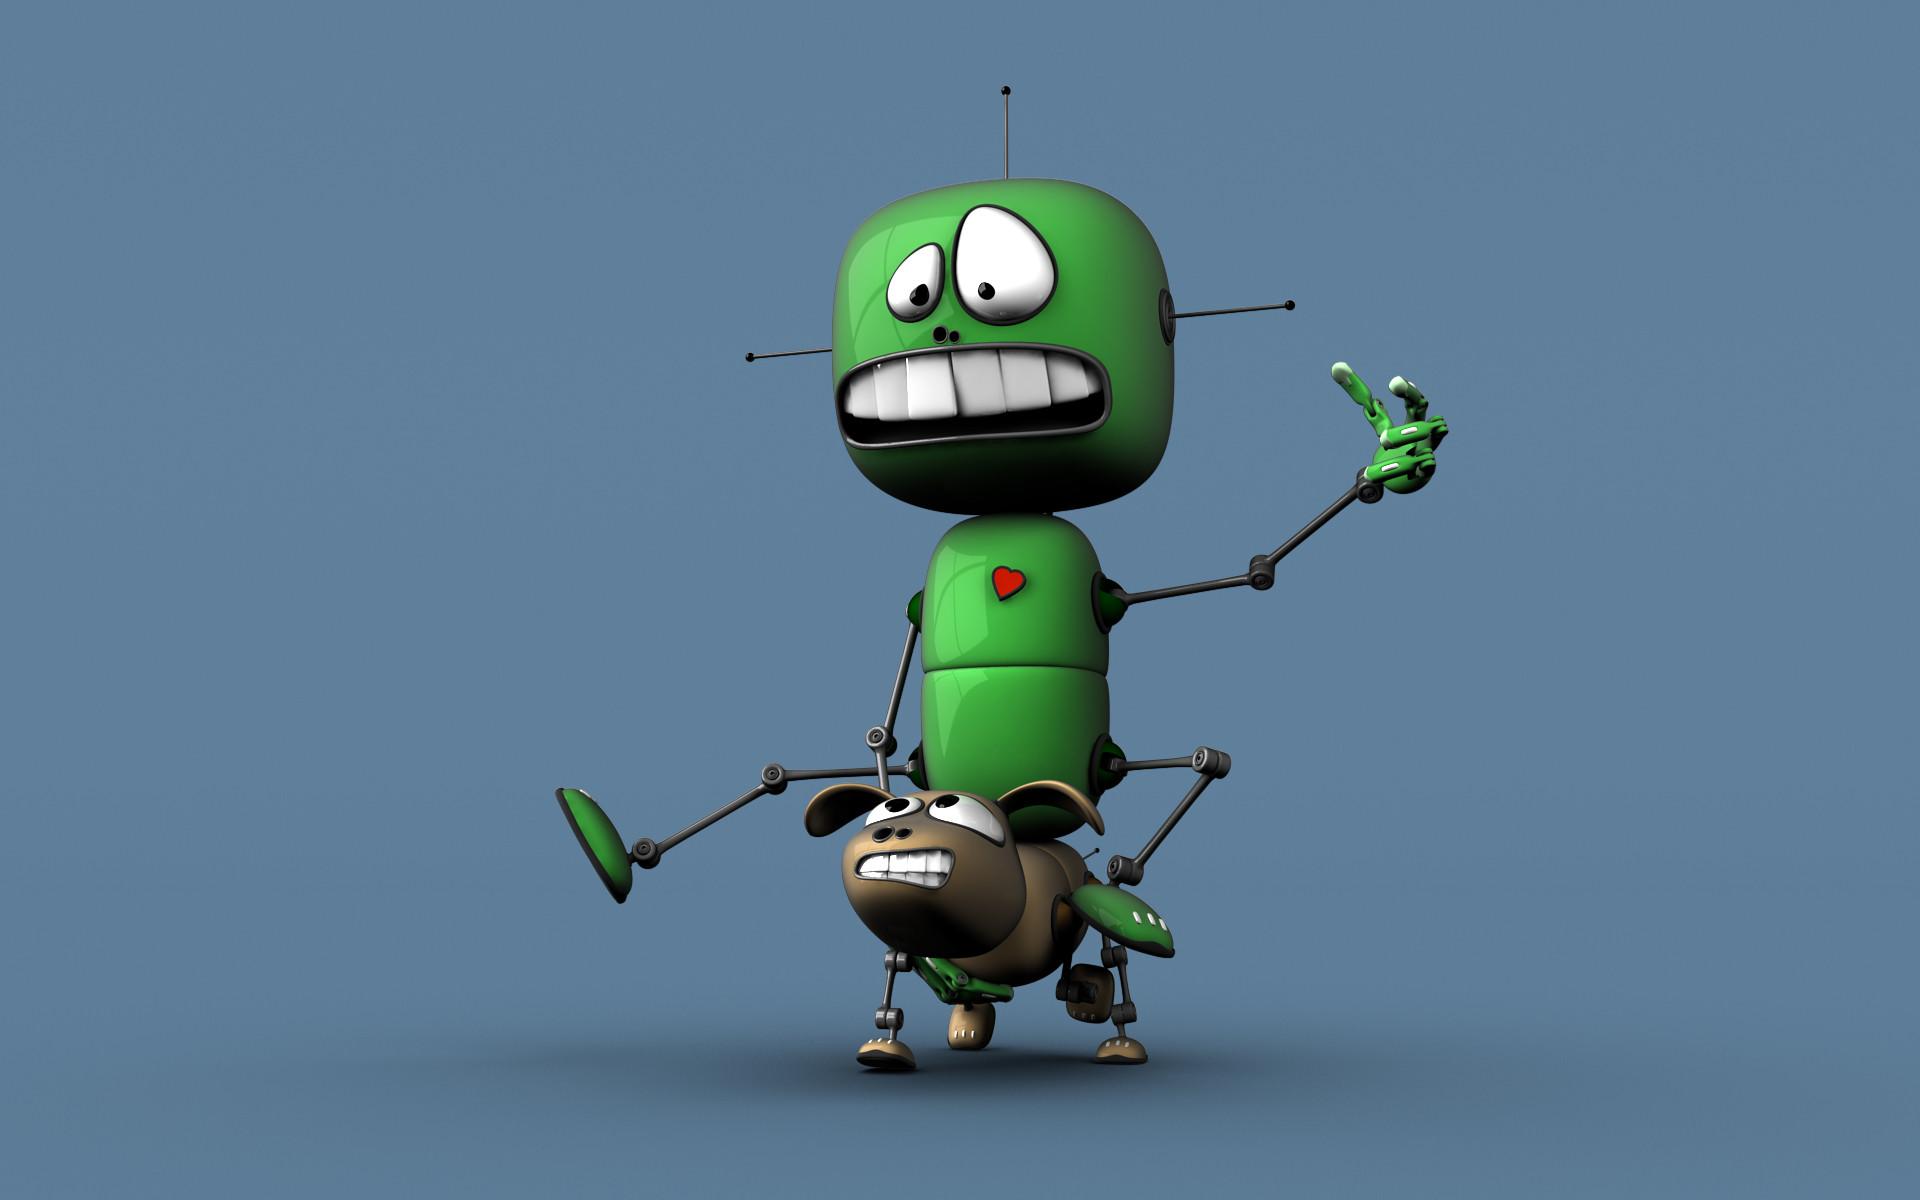 Omg wallpapers 70 images - Robot wallpaper 3d ...